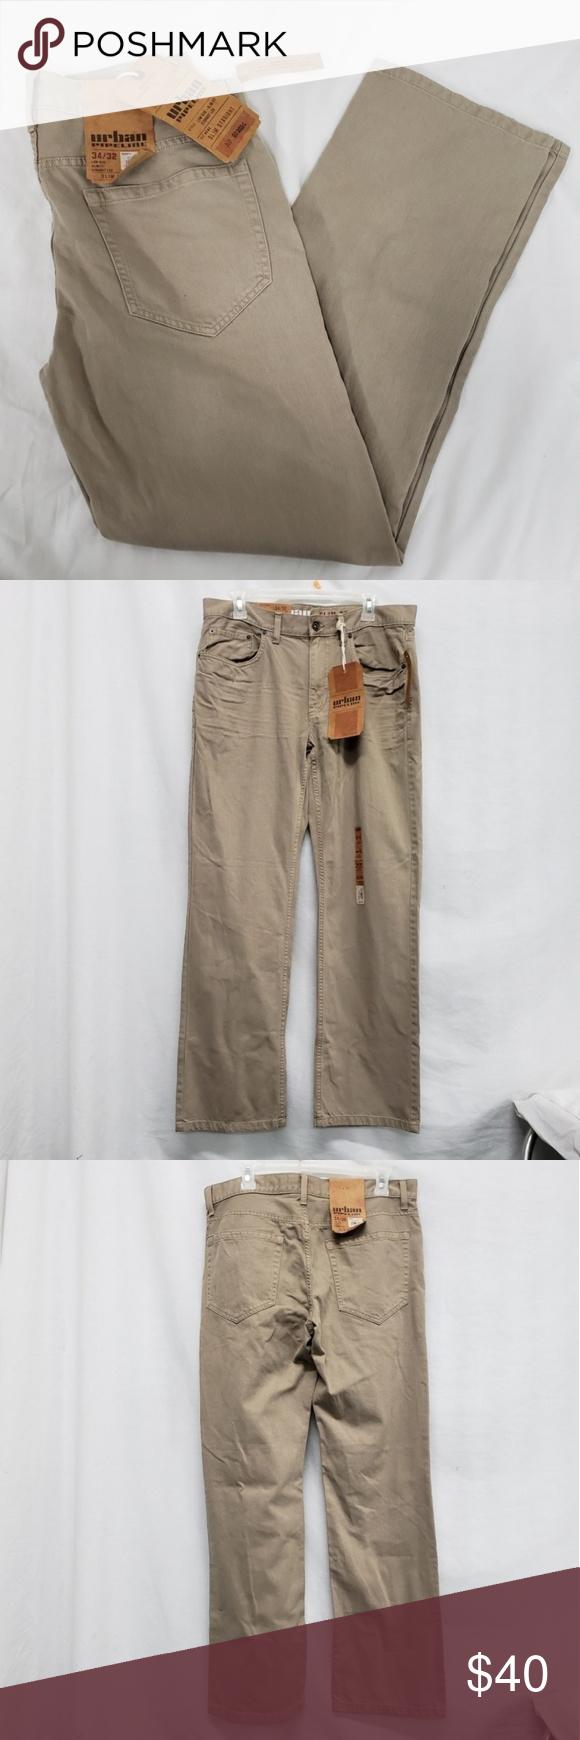 Nwt Urban Pipeline Slim Straight Jeans Slim Straight Jeans Straight Jeans Clothes Design